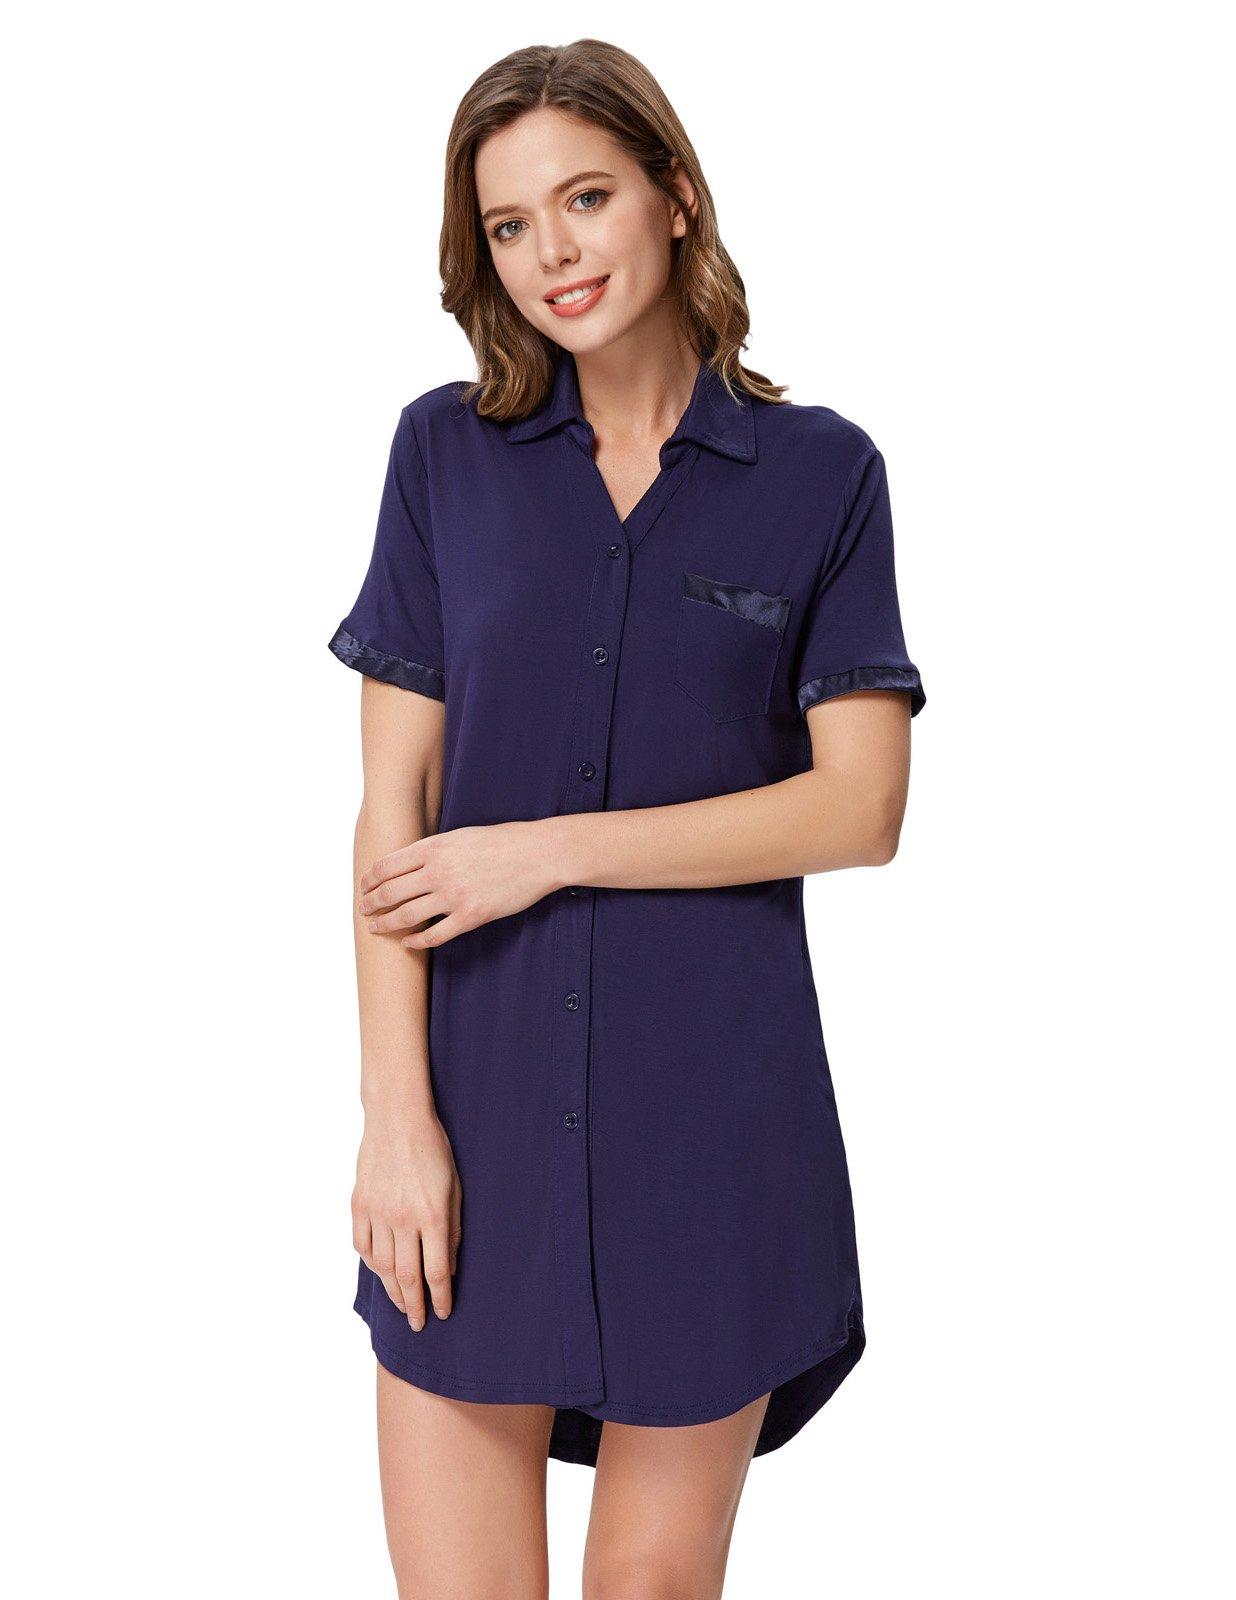 Zexxxy Women's Pj Shirt Long Sleeve Pajama Top Button Down Lapel Sleep Shirt Dress